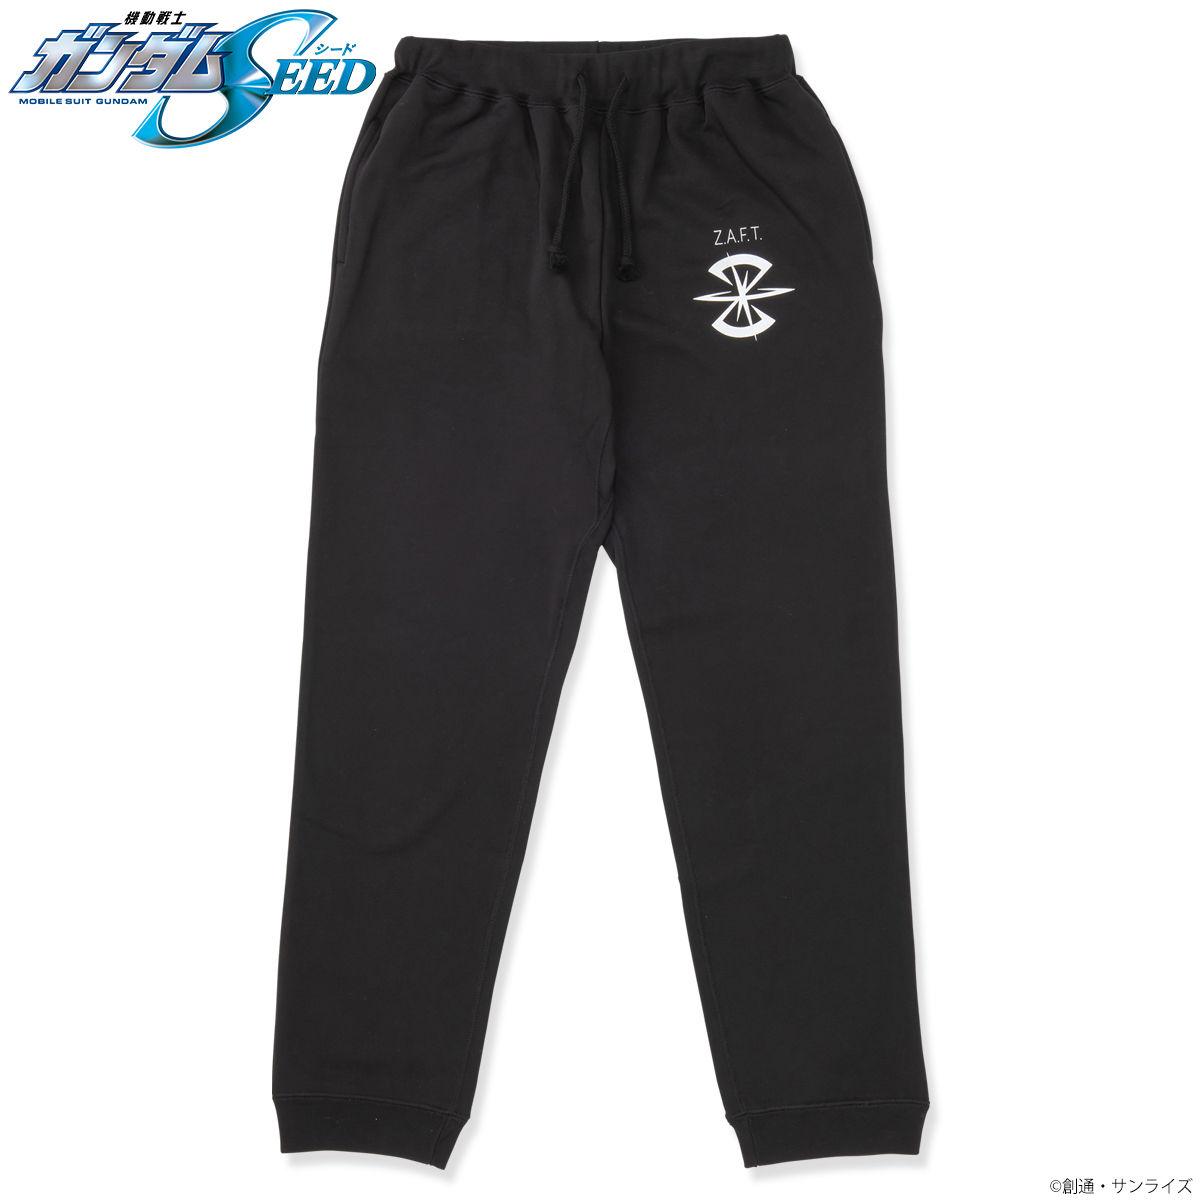 Mobile Suit Gundam SEED ZAFT's Emblem Workout Pants